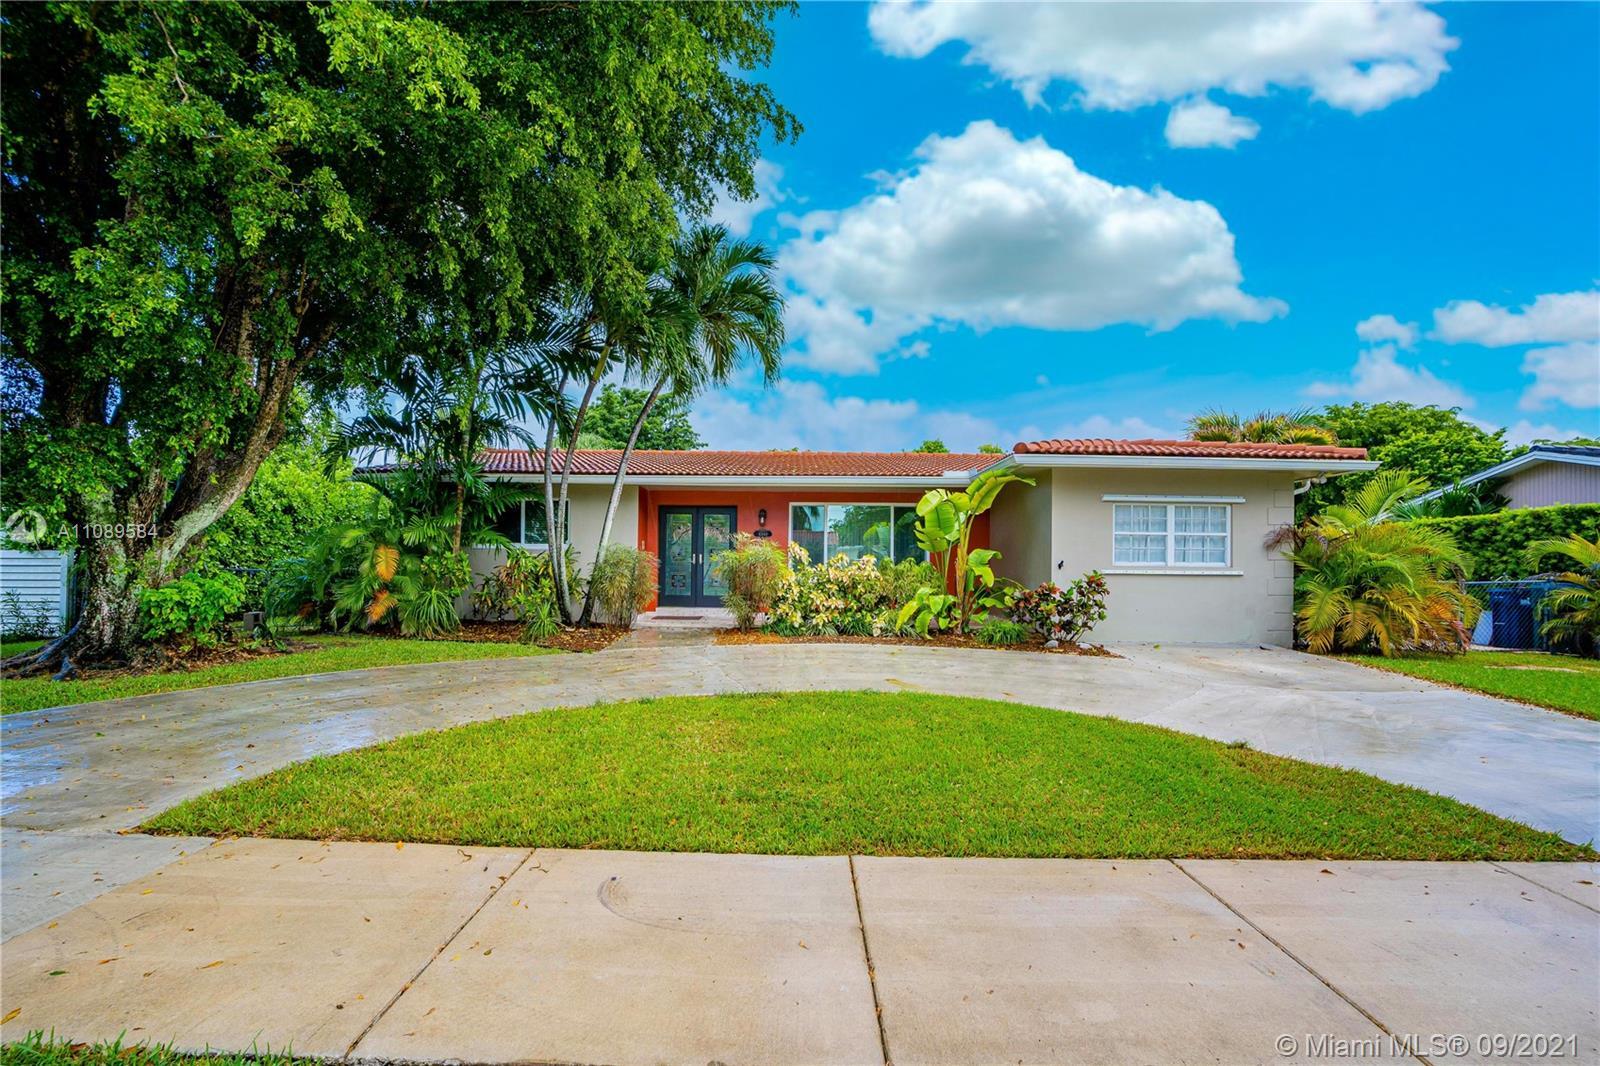 6540 48th St, South Miami, Florida 33155